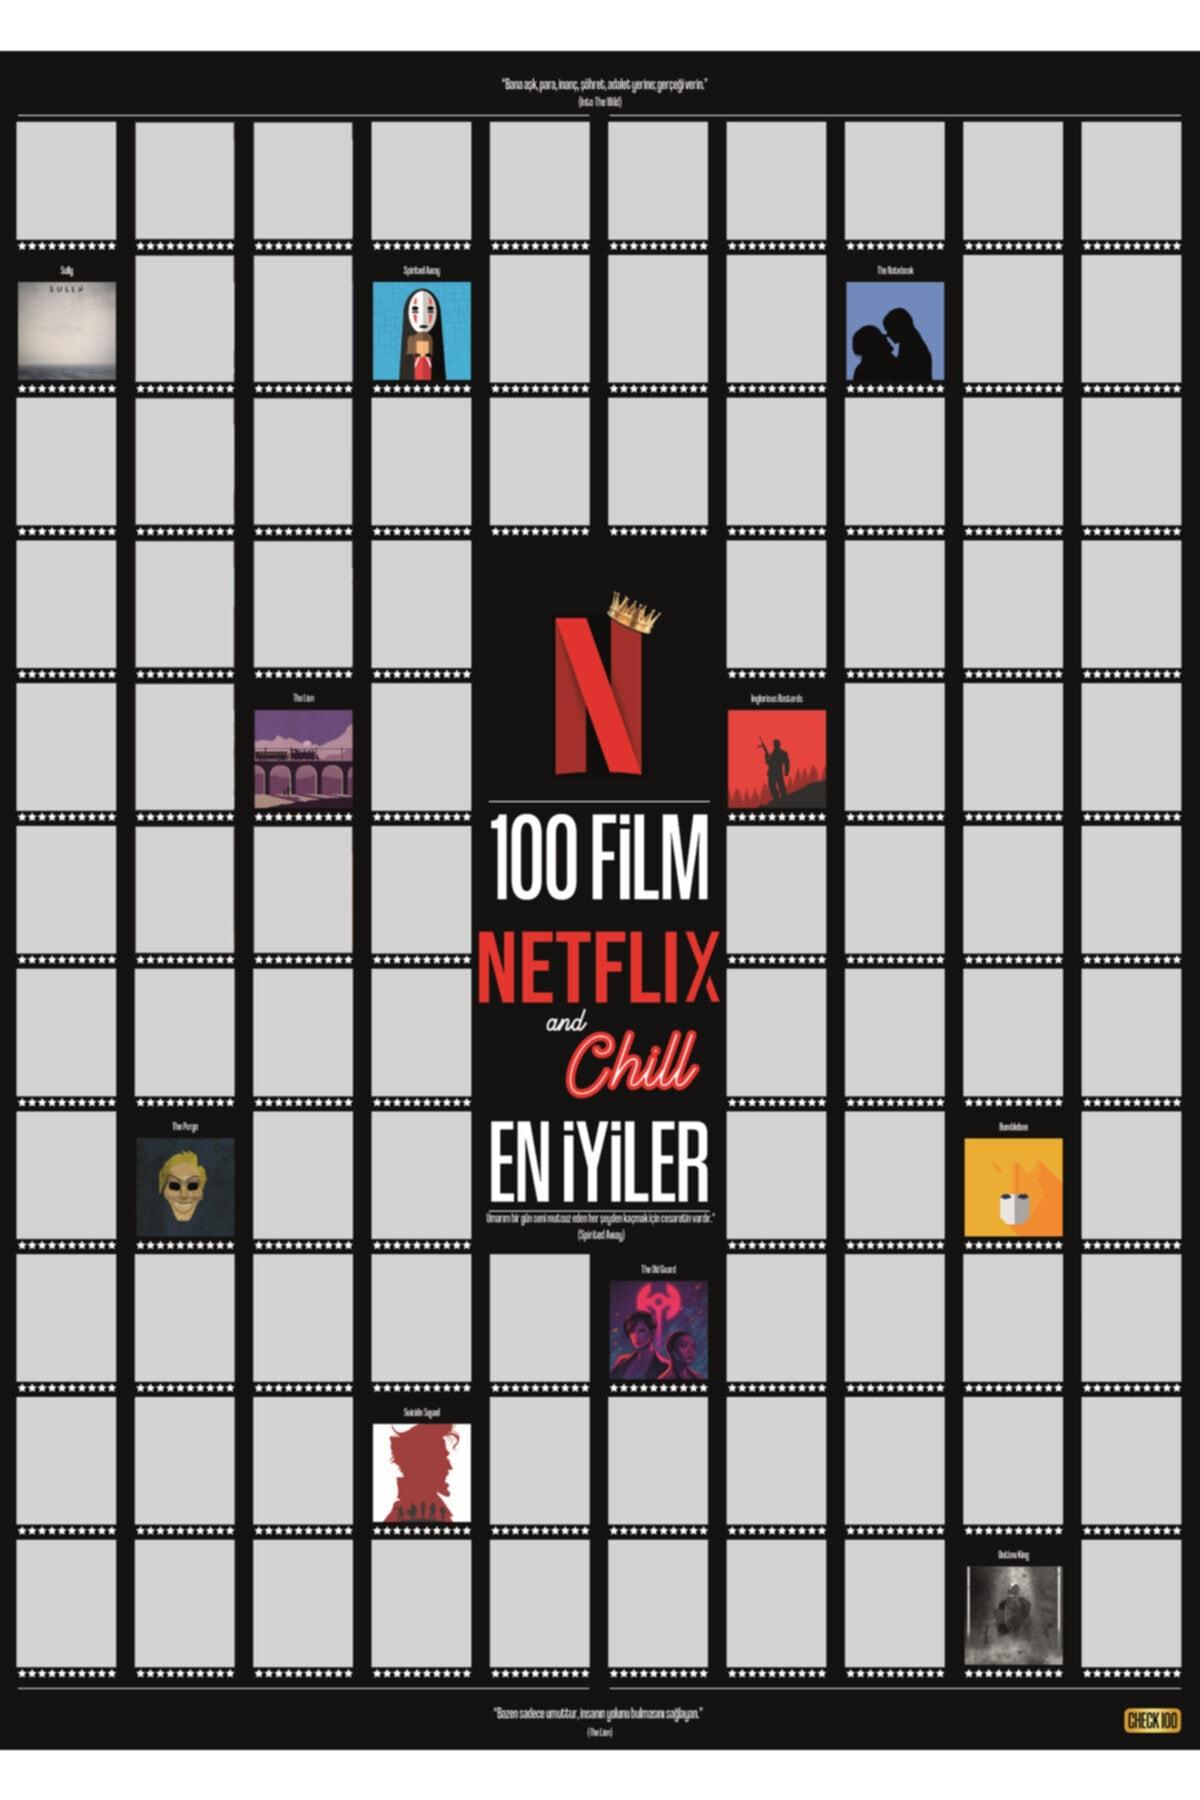 Netflix And Chill 100 Film En Iyiler Kazıkazan Poster